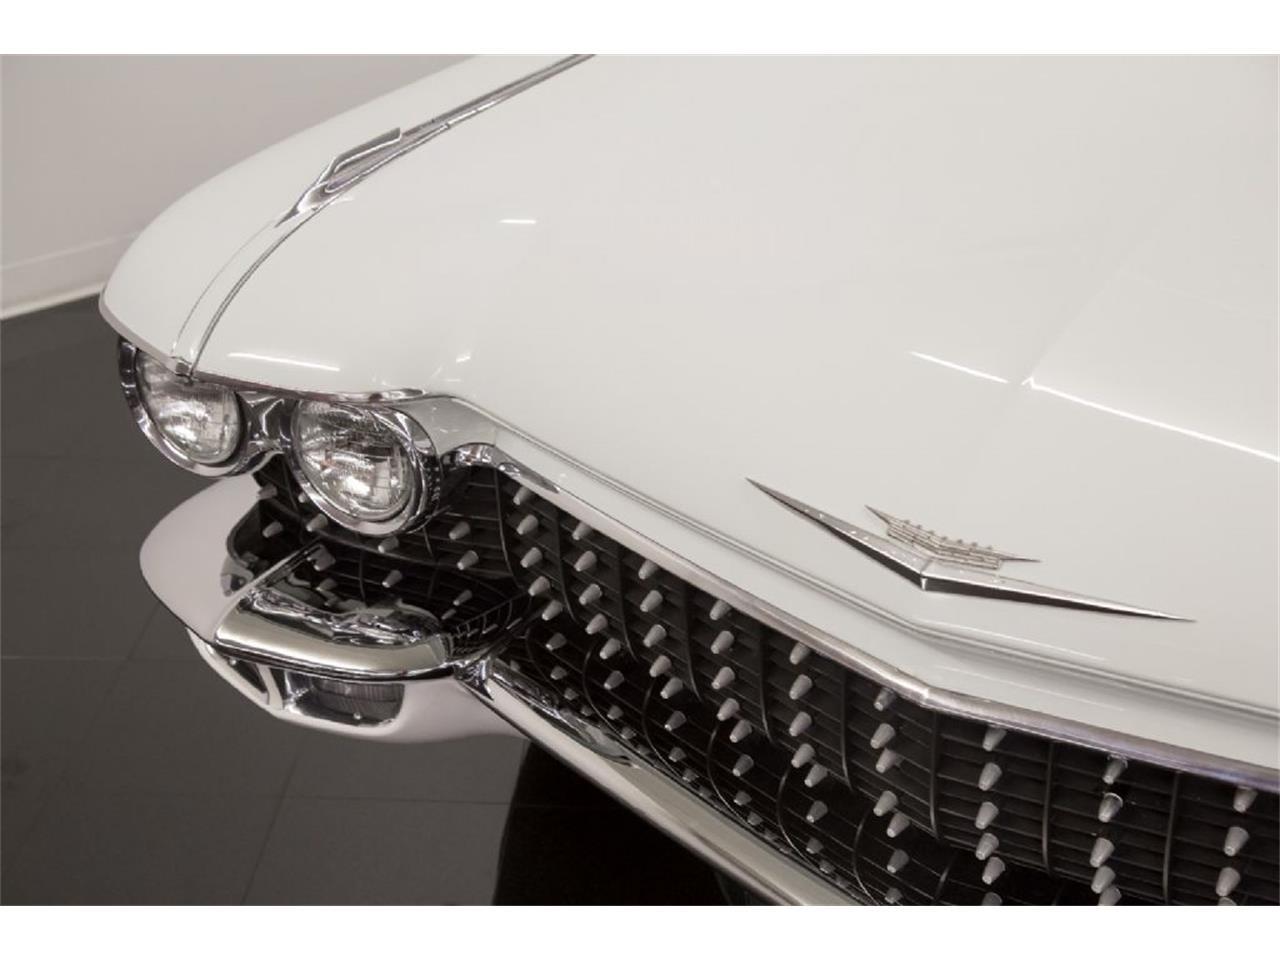 1960 Cadillac Eldorado for sale in St. Louis, MO ...